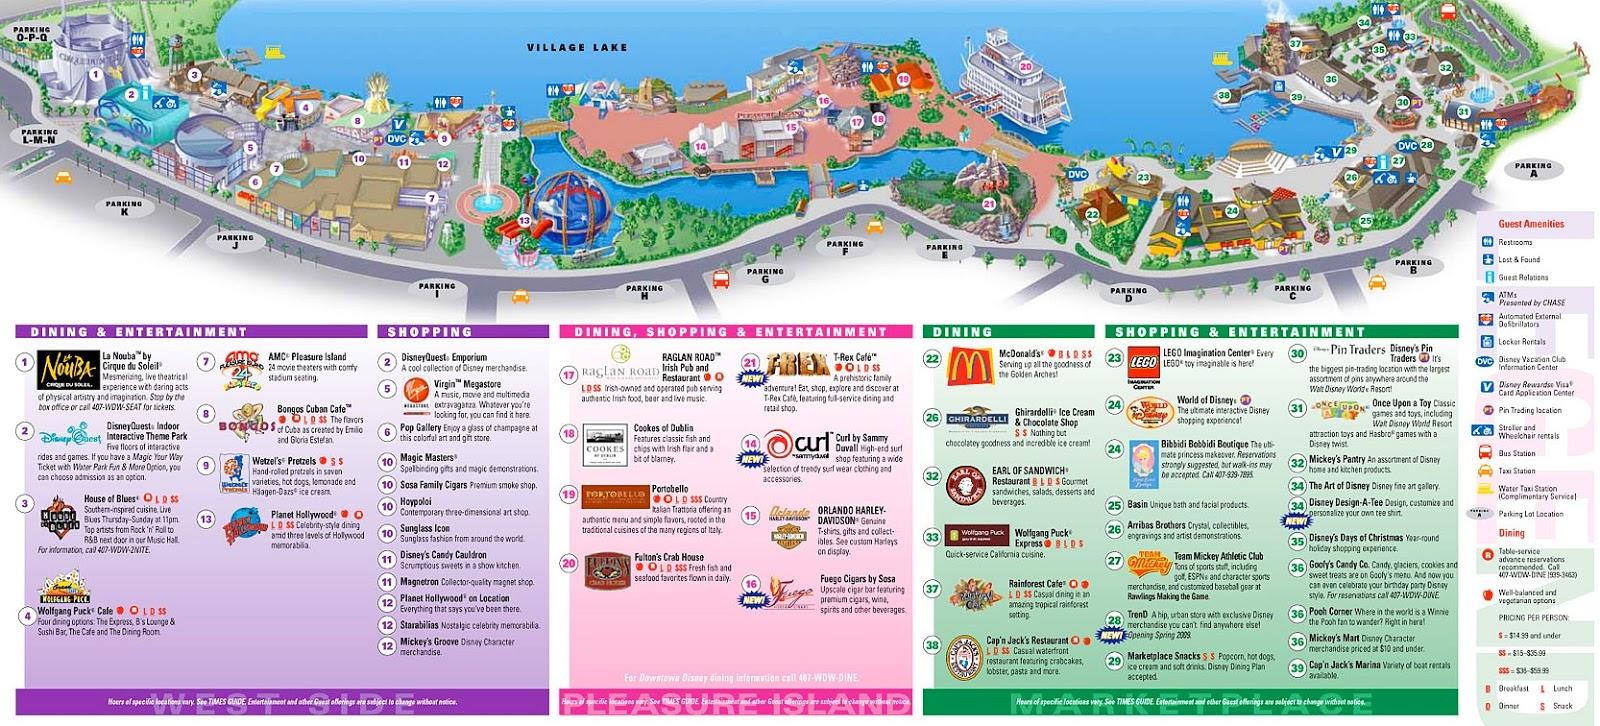 of Disney pleasure island history